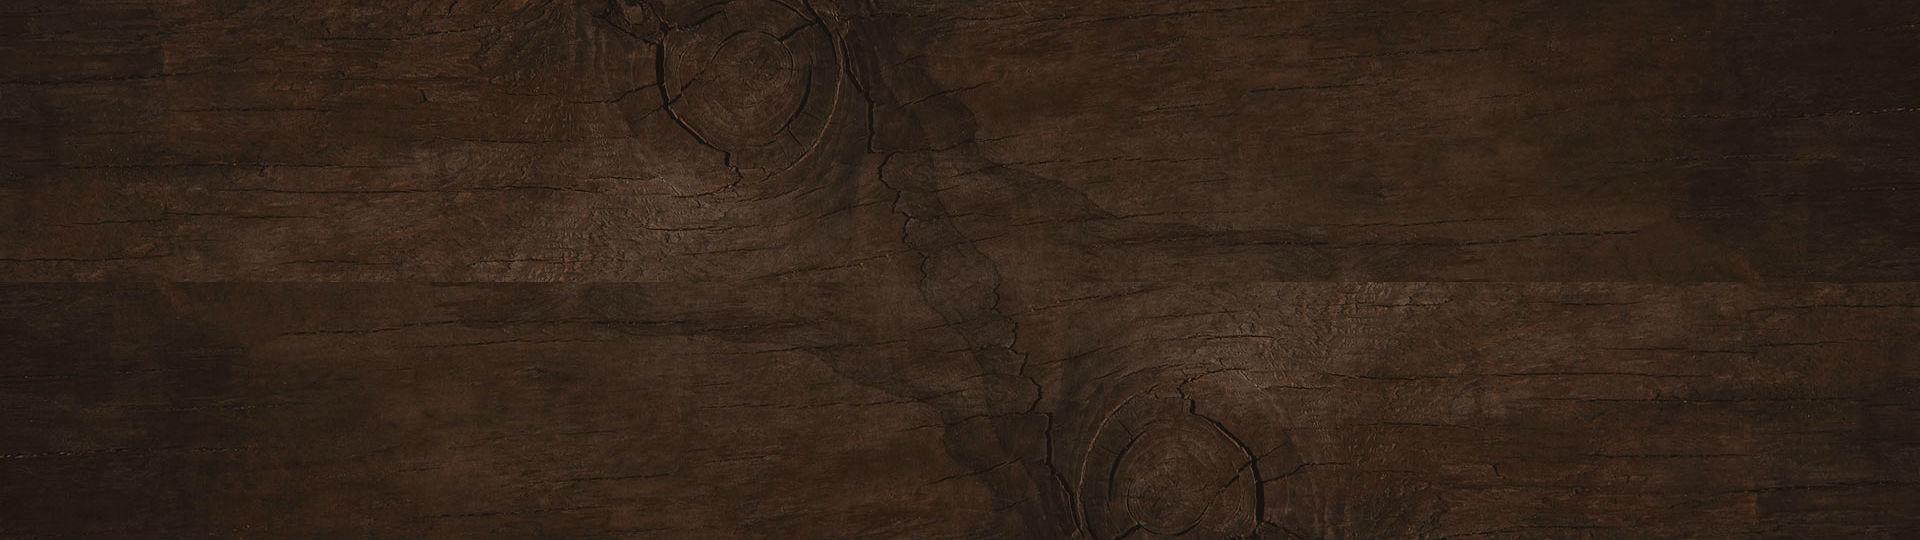 catlogos productos rsticos madera - Madera Rustica